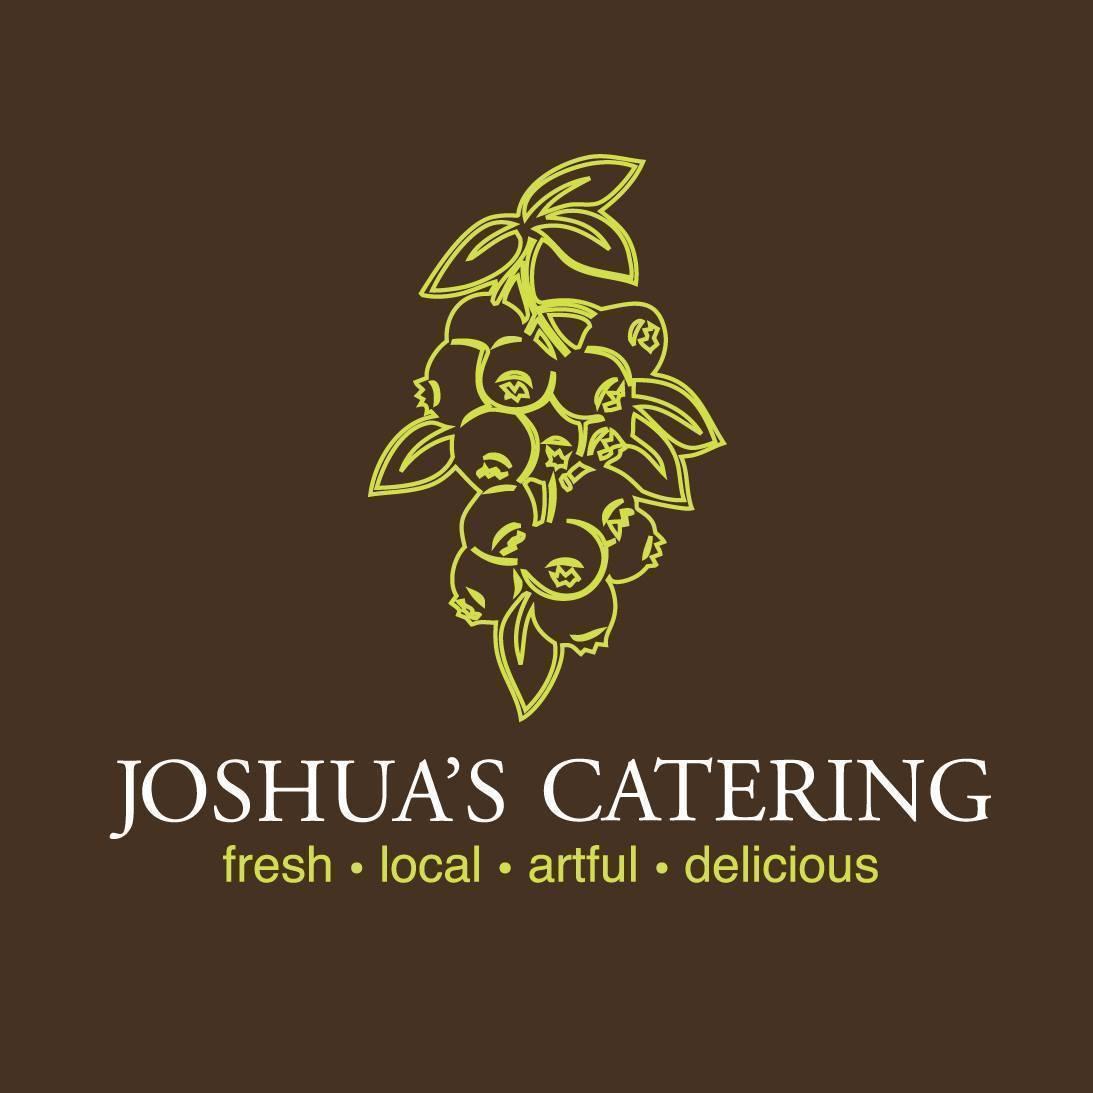 Joshua Catering